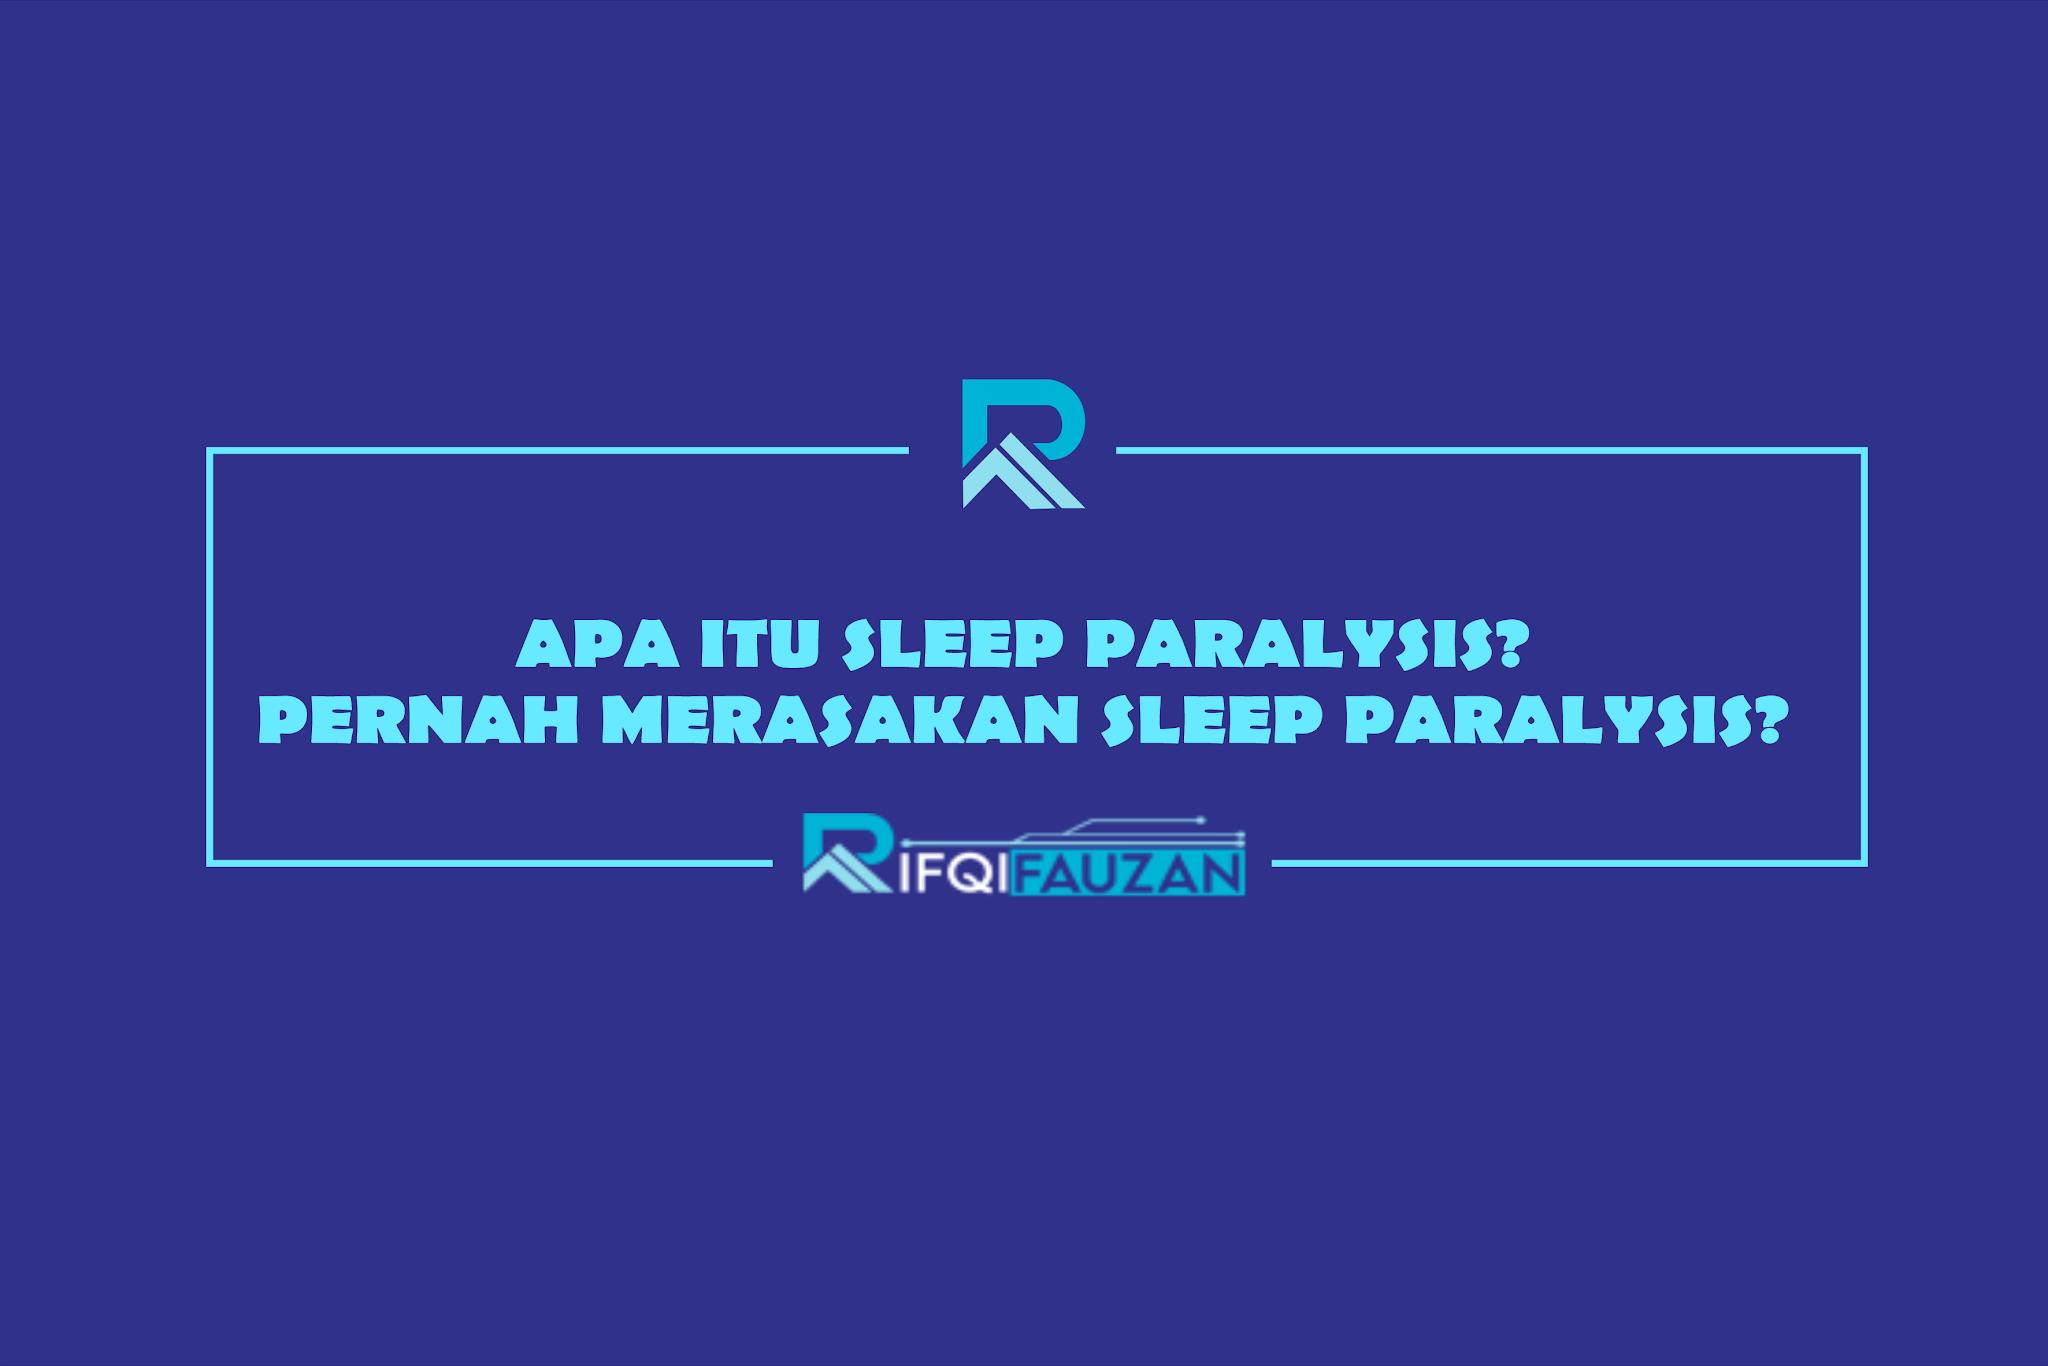 APA ITU SLEEP PARALYSIS? PERNAH MERASAKAN SLEEP PARALYSIS?